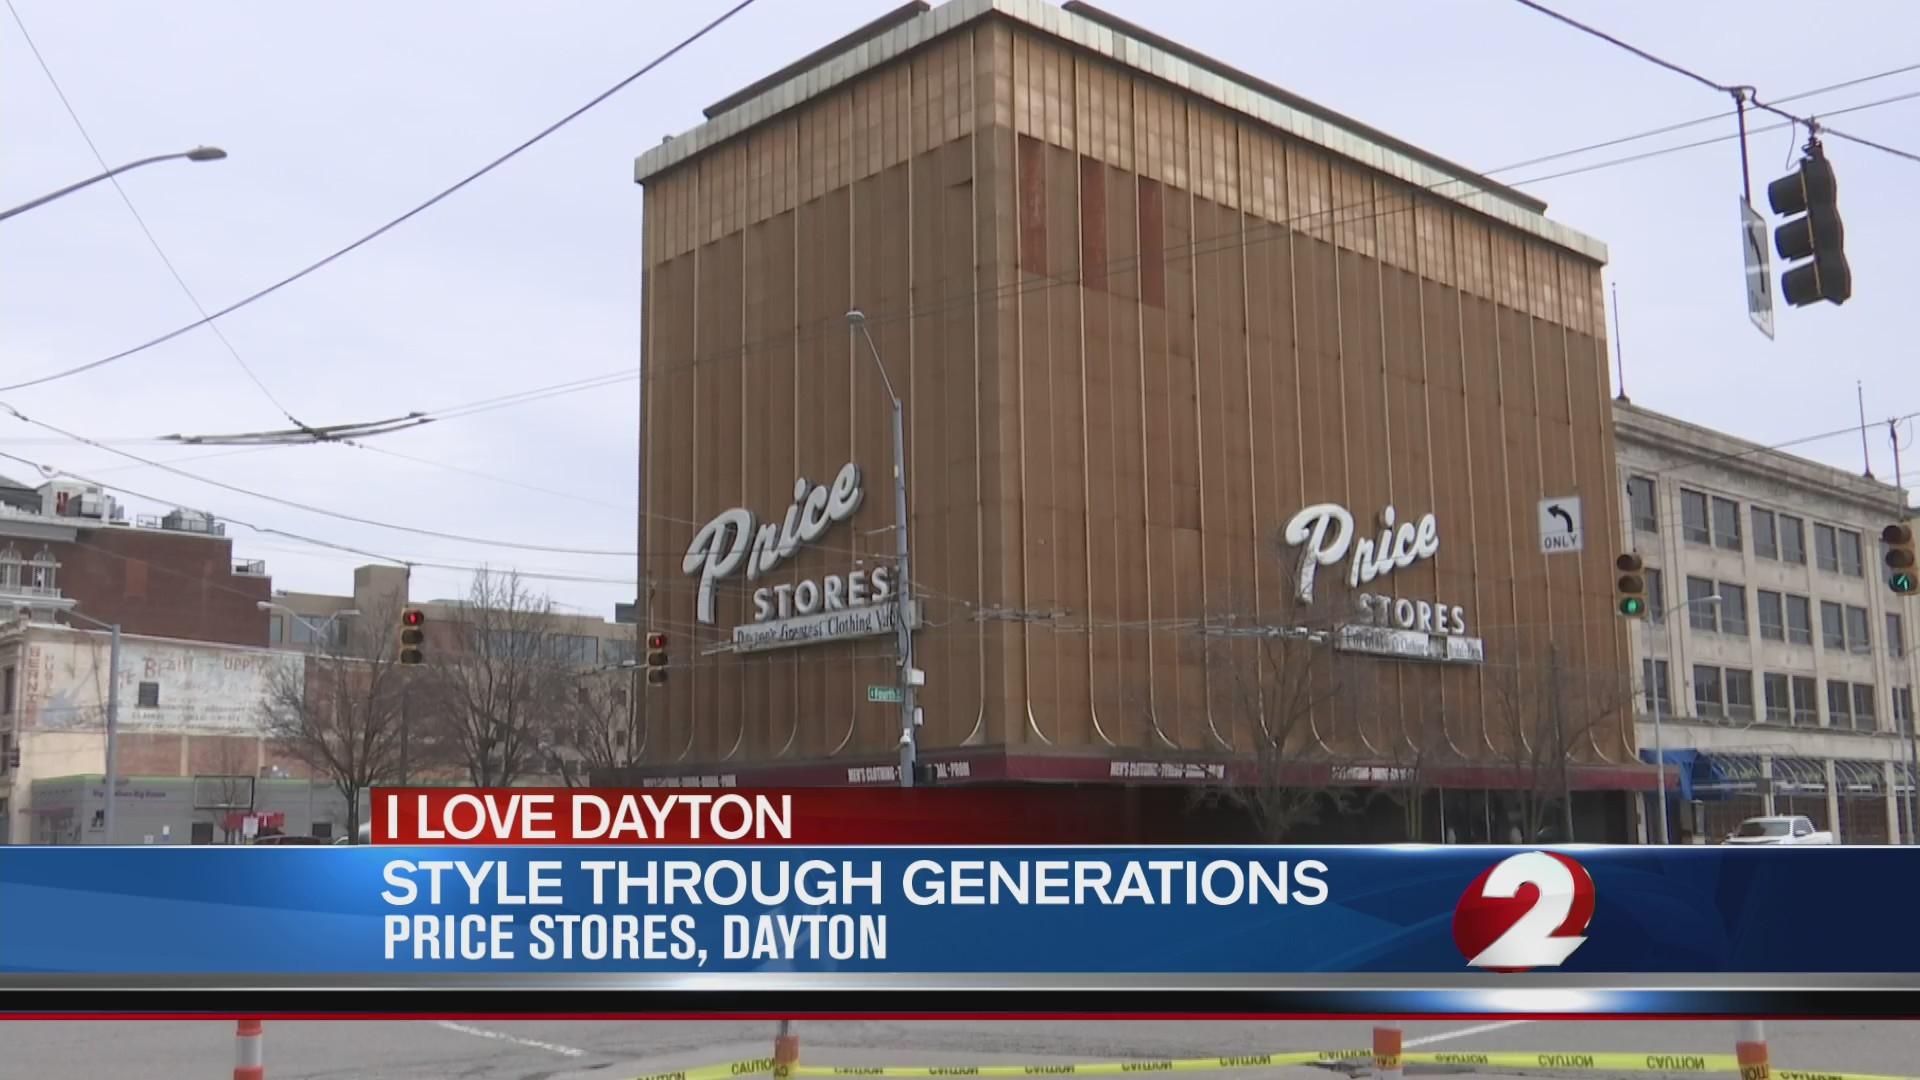 I Love Dayton: Style through generations